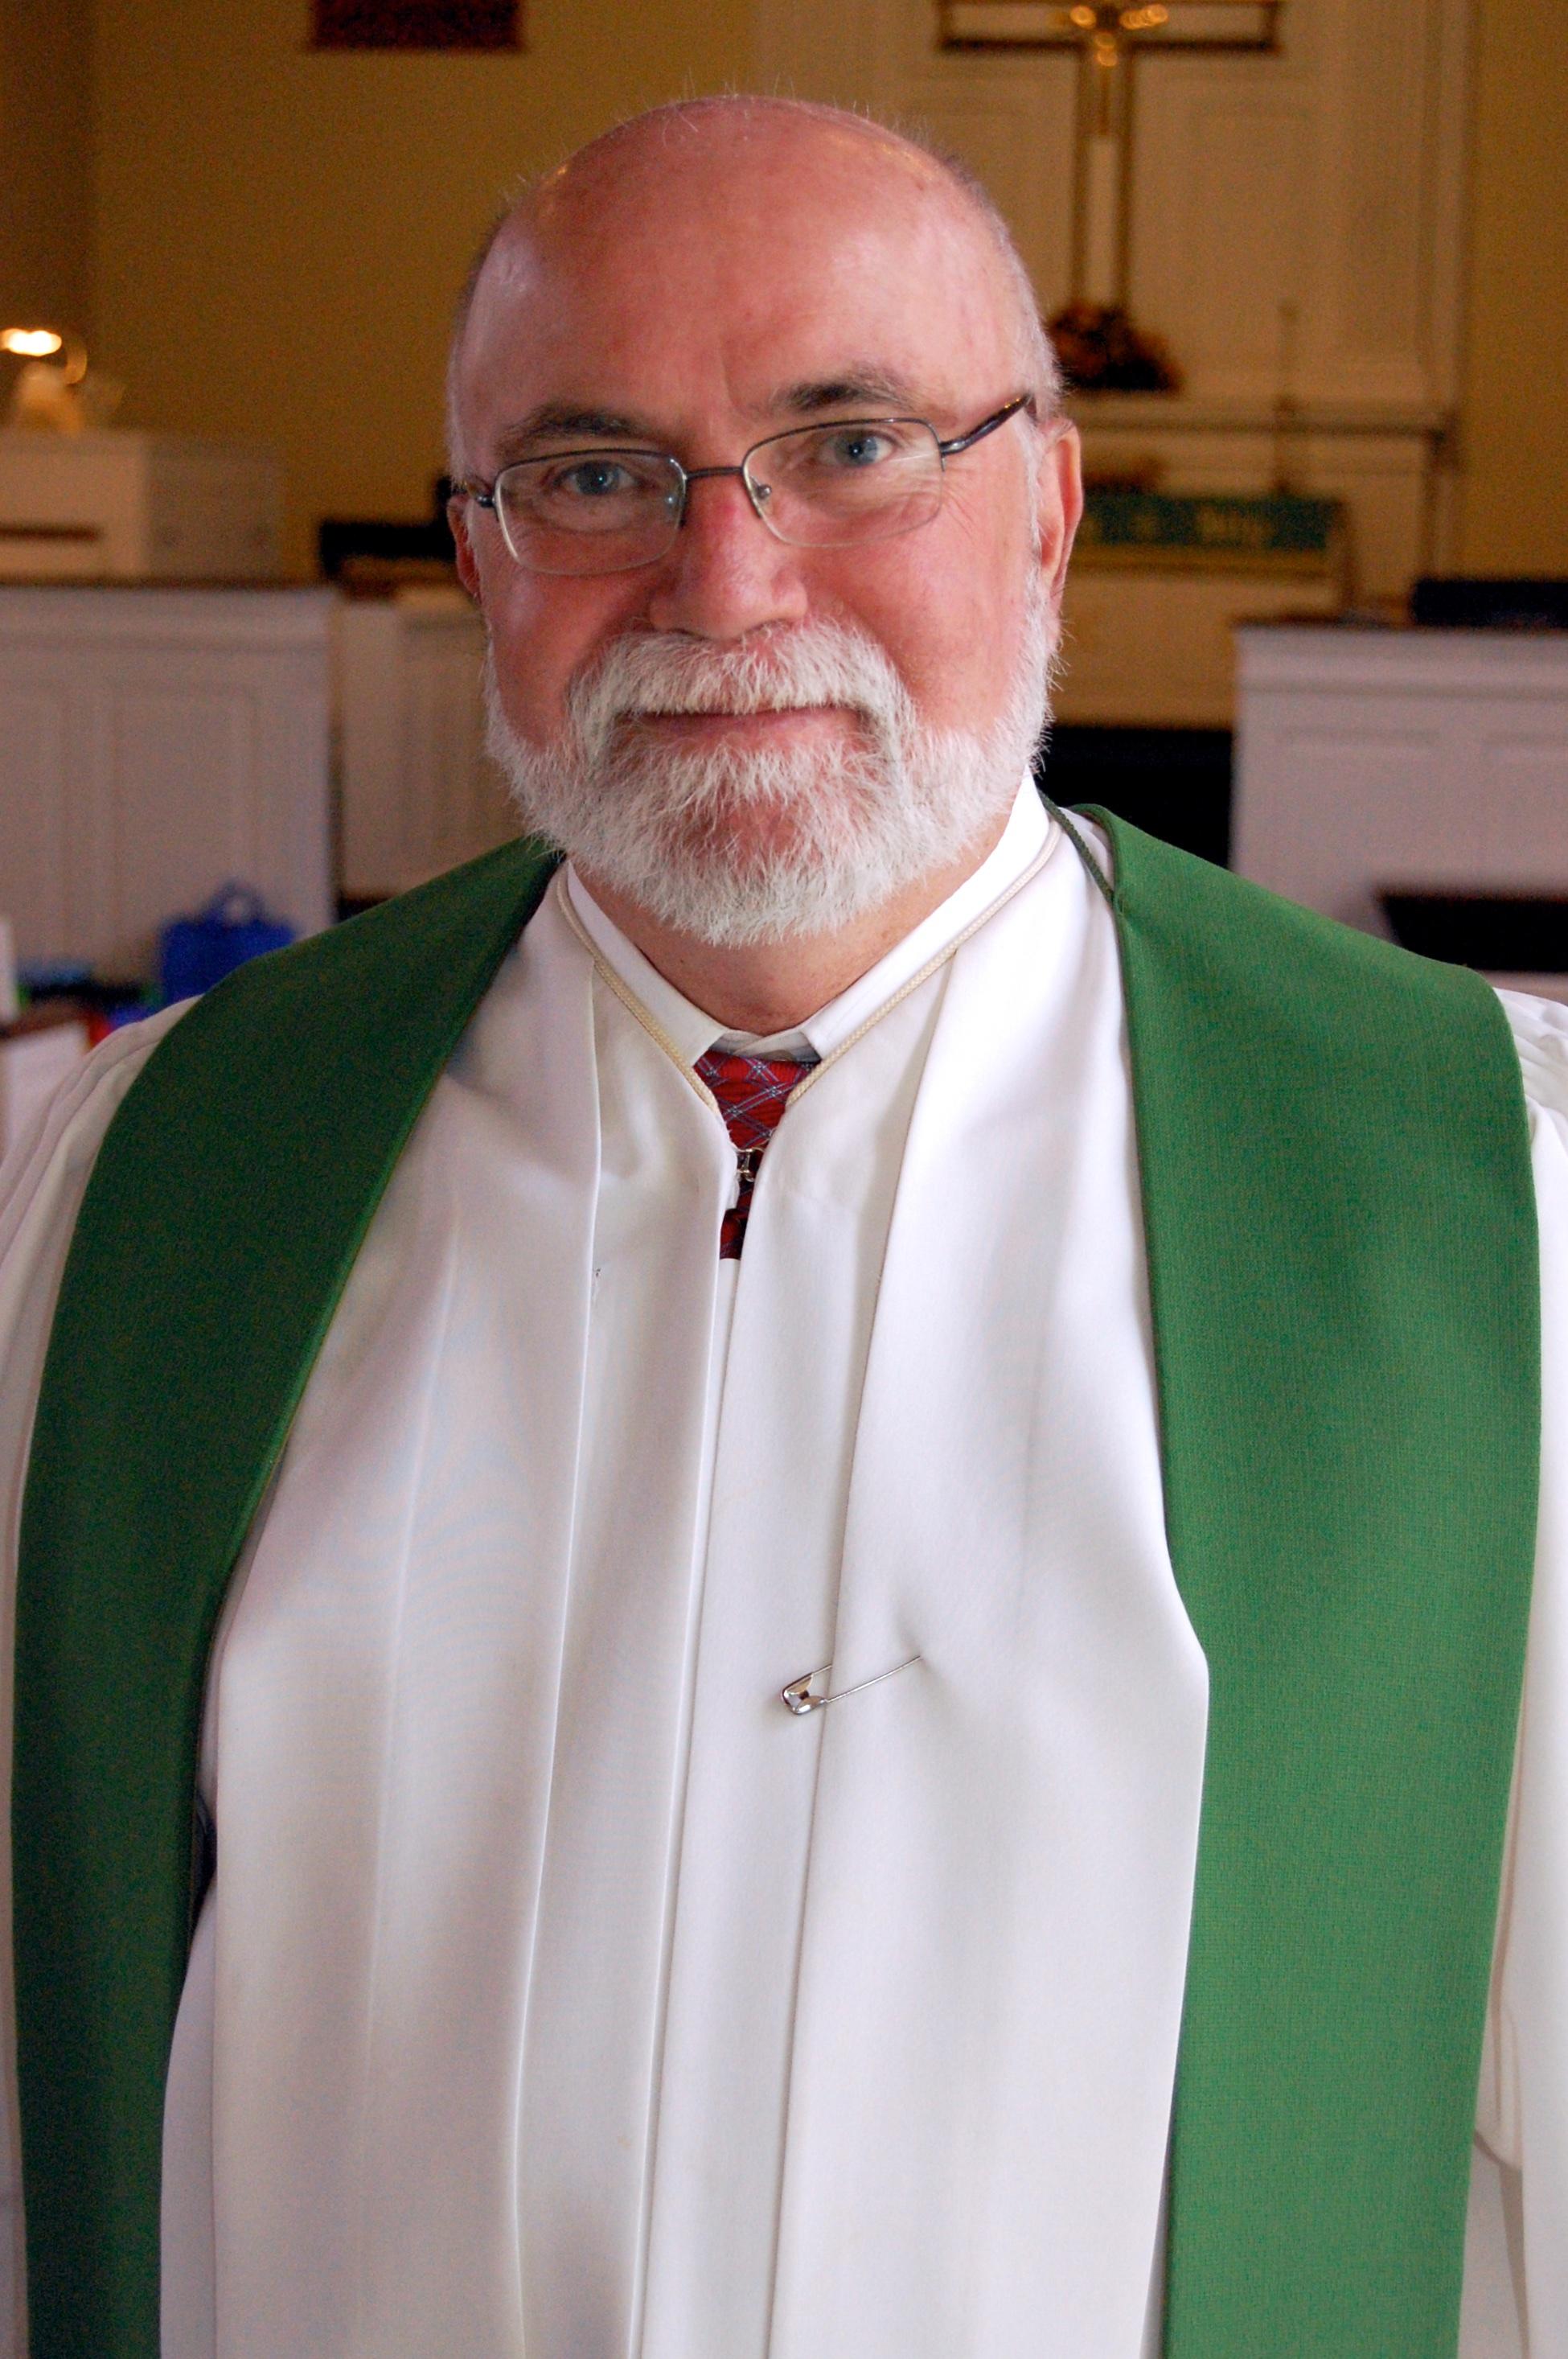 Rev. Joseph Gastiger, Pastor